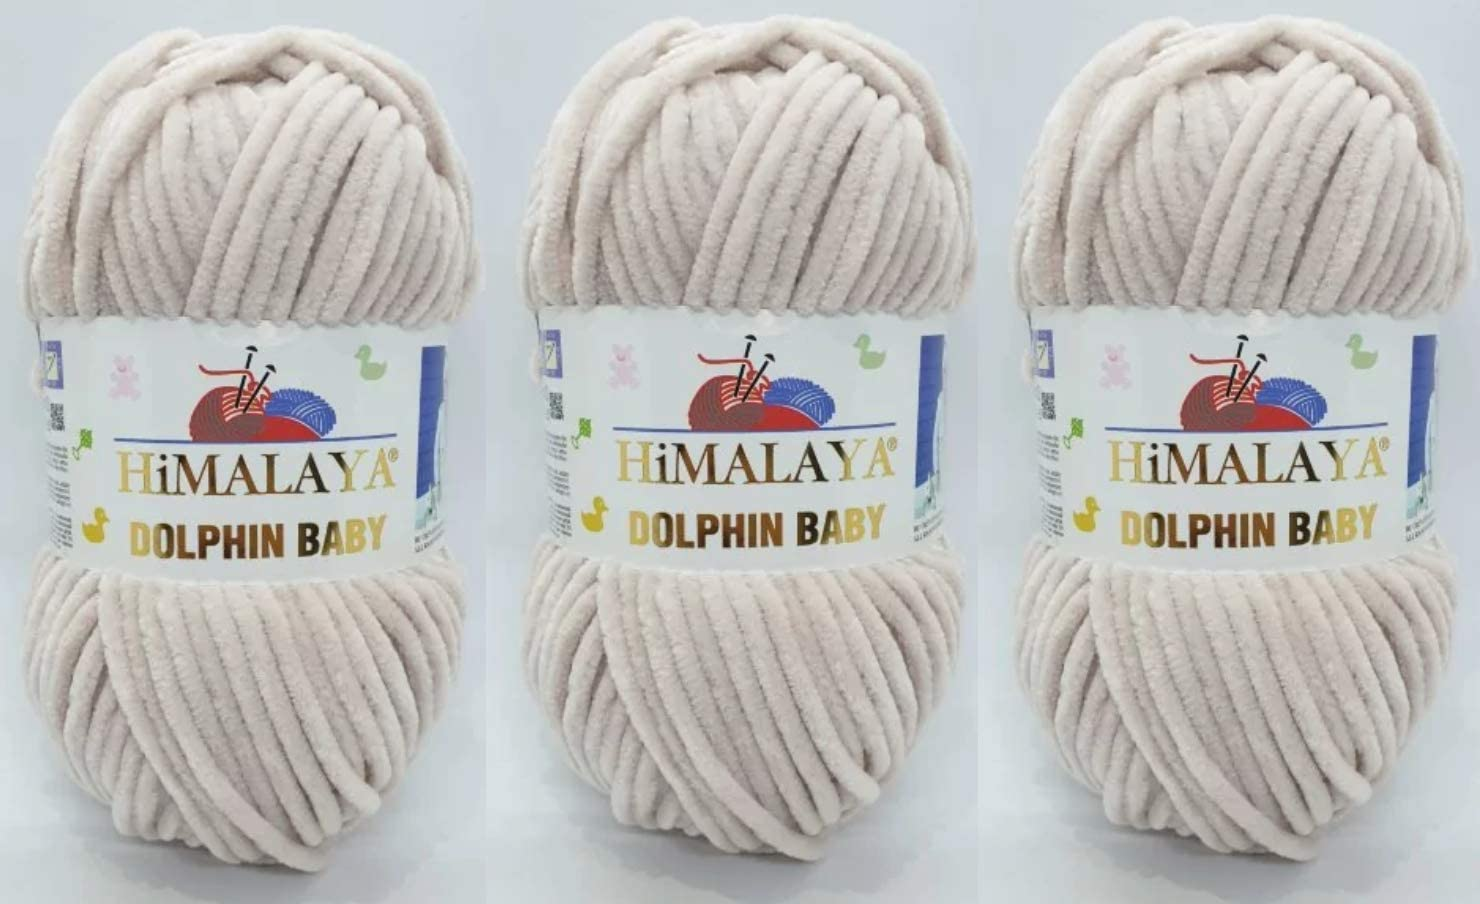 3 Skeins Himalaya Dolphin Baby Directly managed store Yarn 3x100gram Bu 395 Popular brand in the world Super Yards